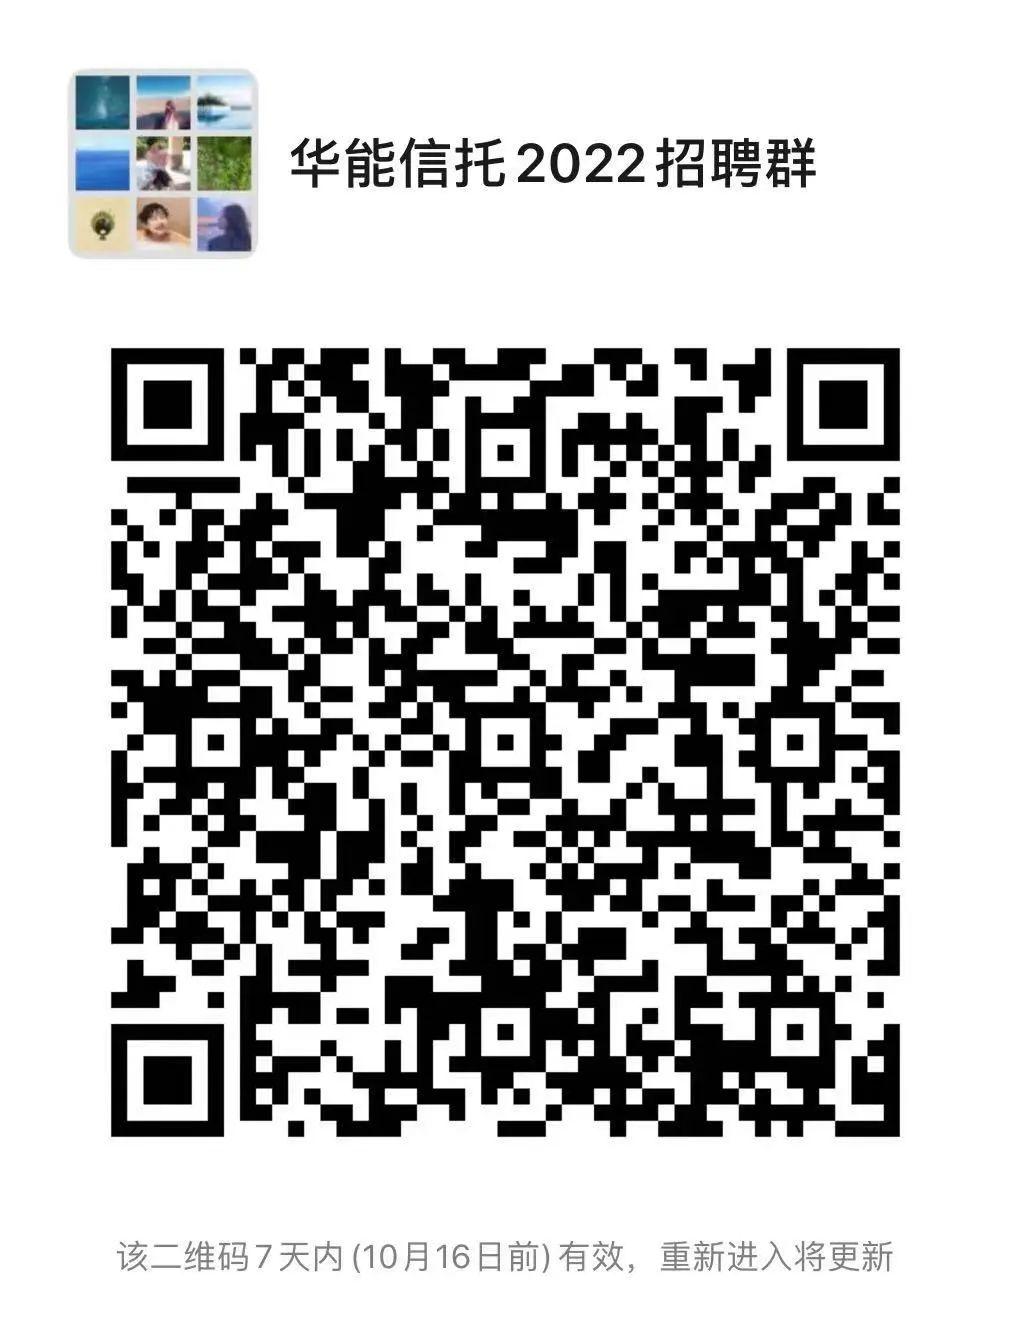 adb7deec2da9483000791b3d9561cdfc.jpg